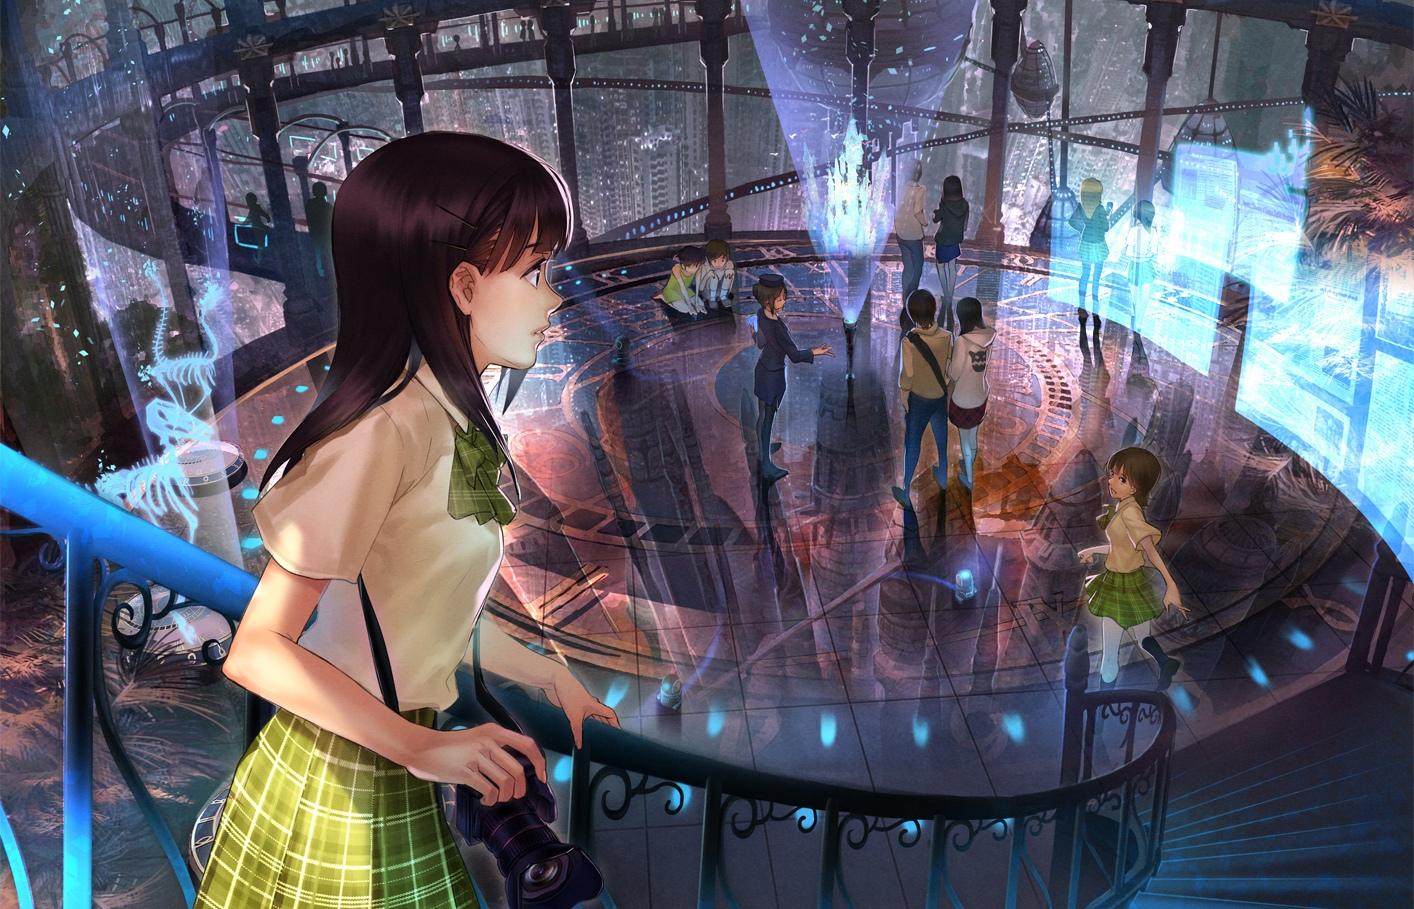 art-Anime-liduke-(artist)-Кликабельно-288336